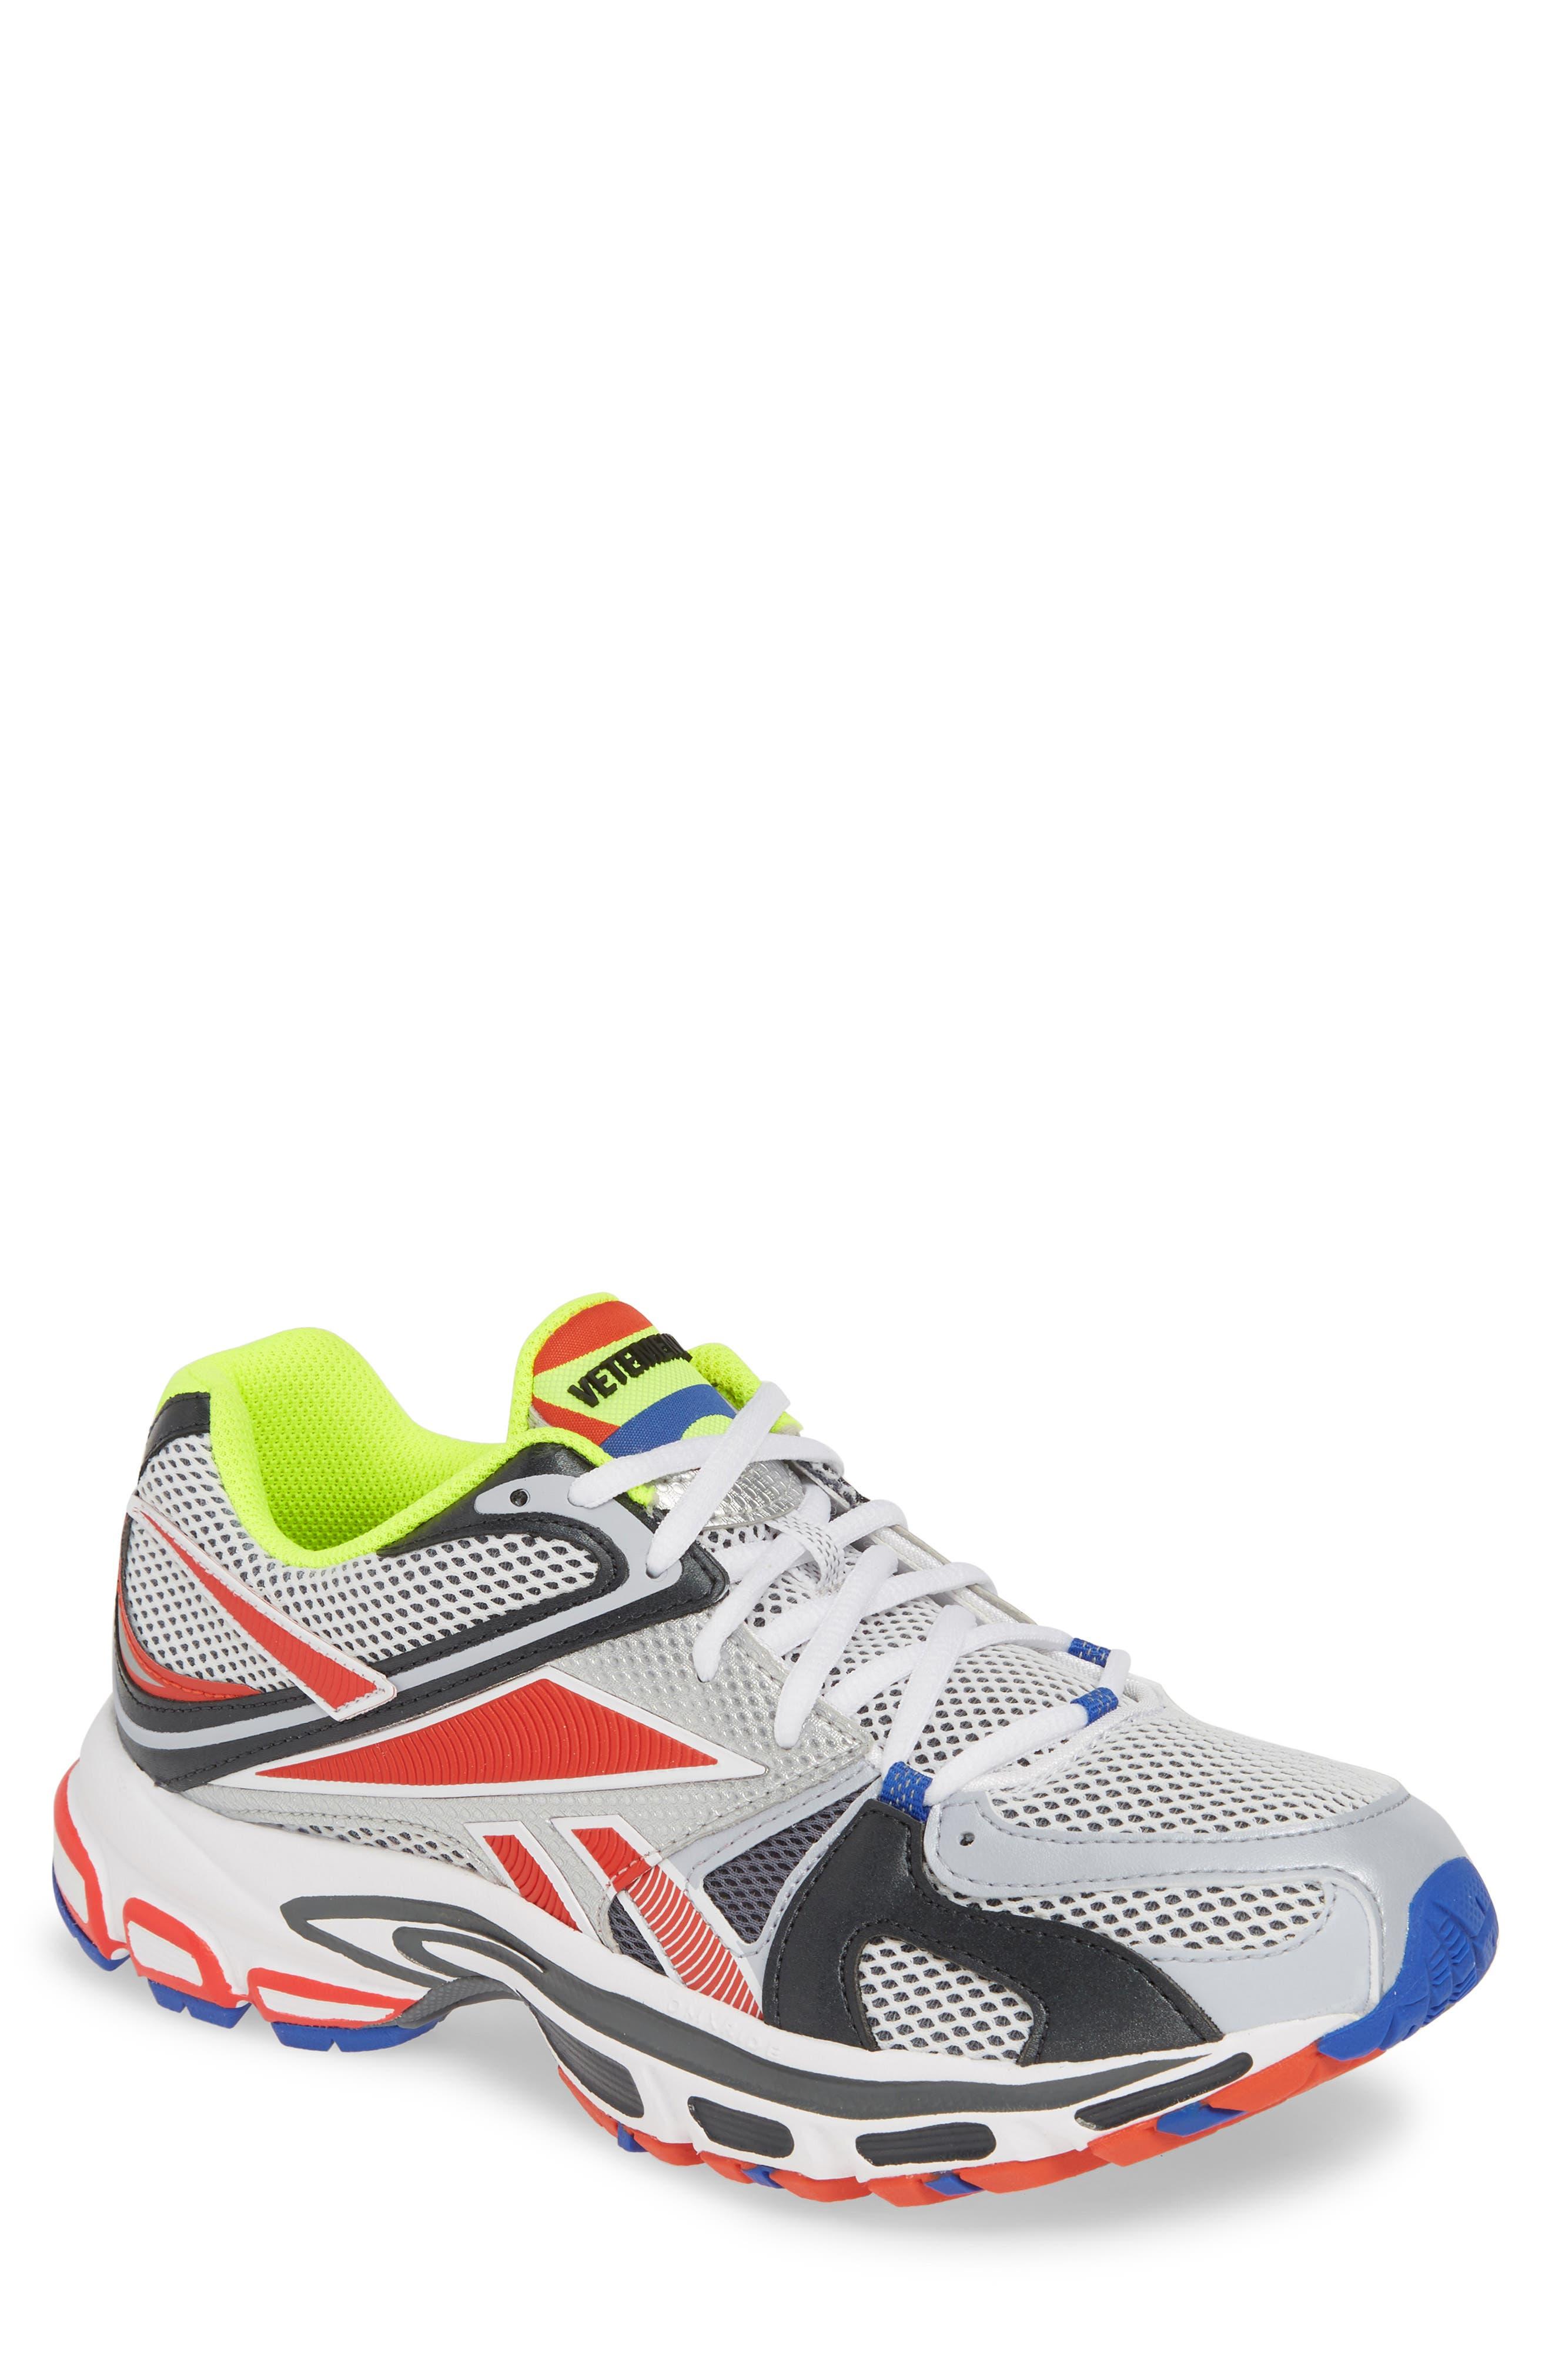 VETEMENTS x Reebok Spike Runner 200 Sneaker, Main, color, FLUO YELLOW